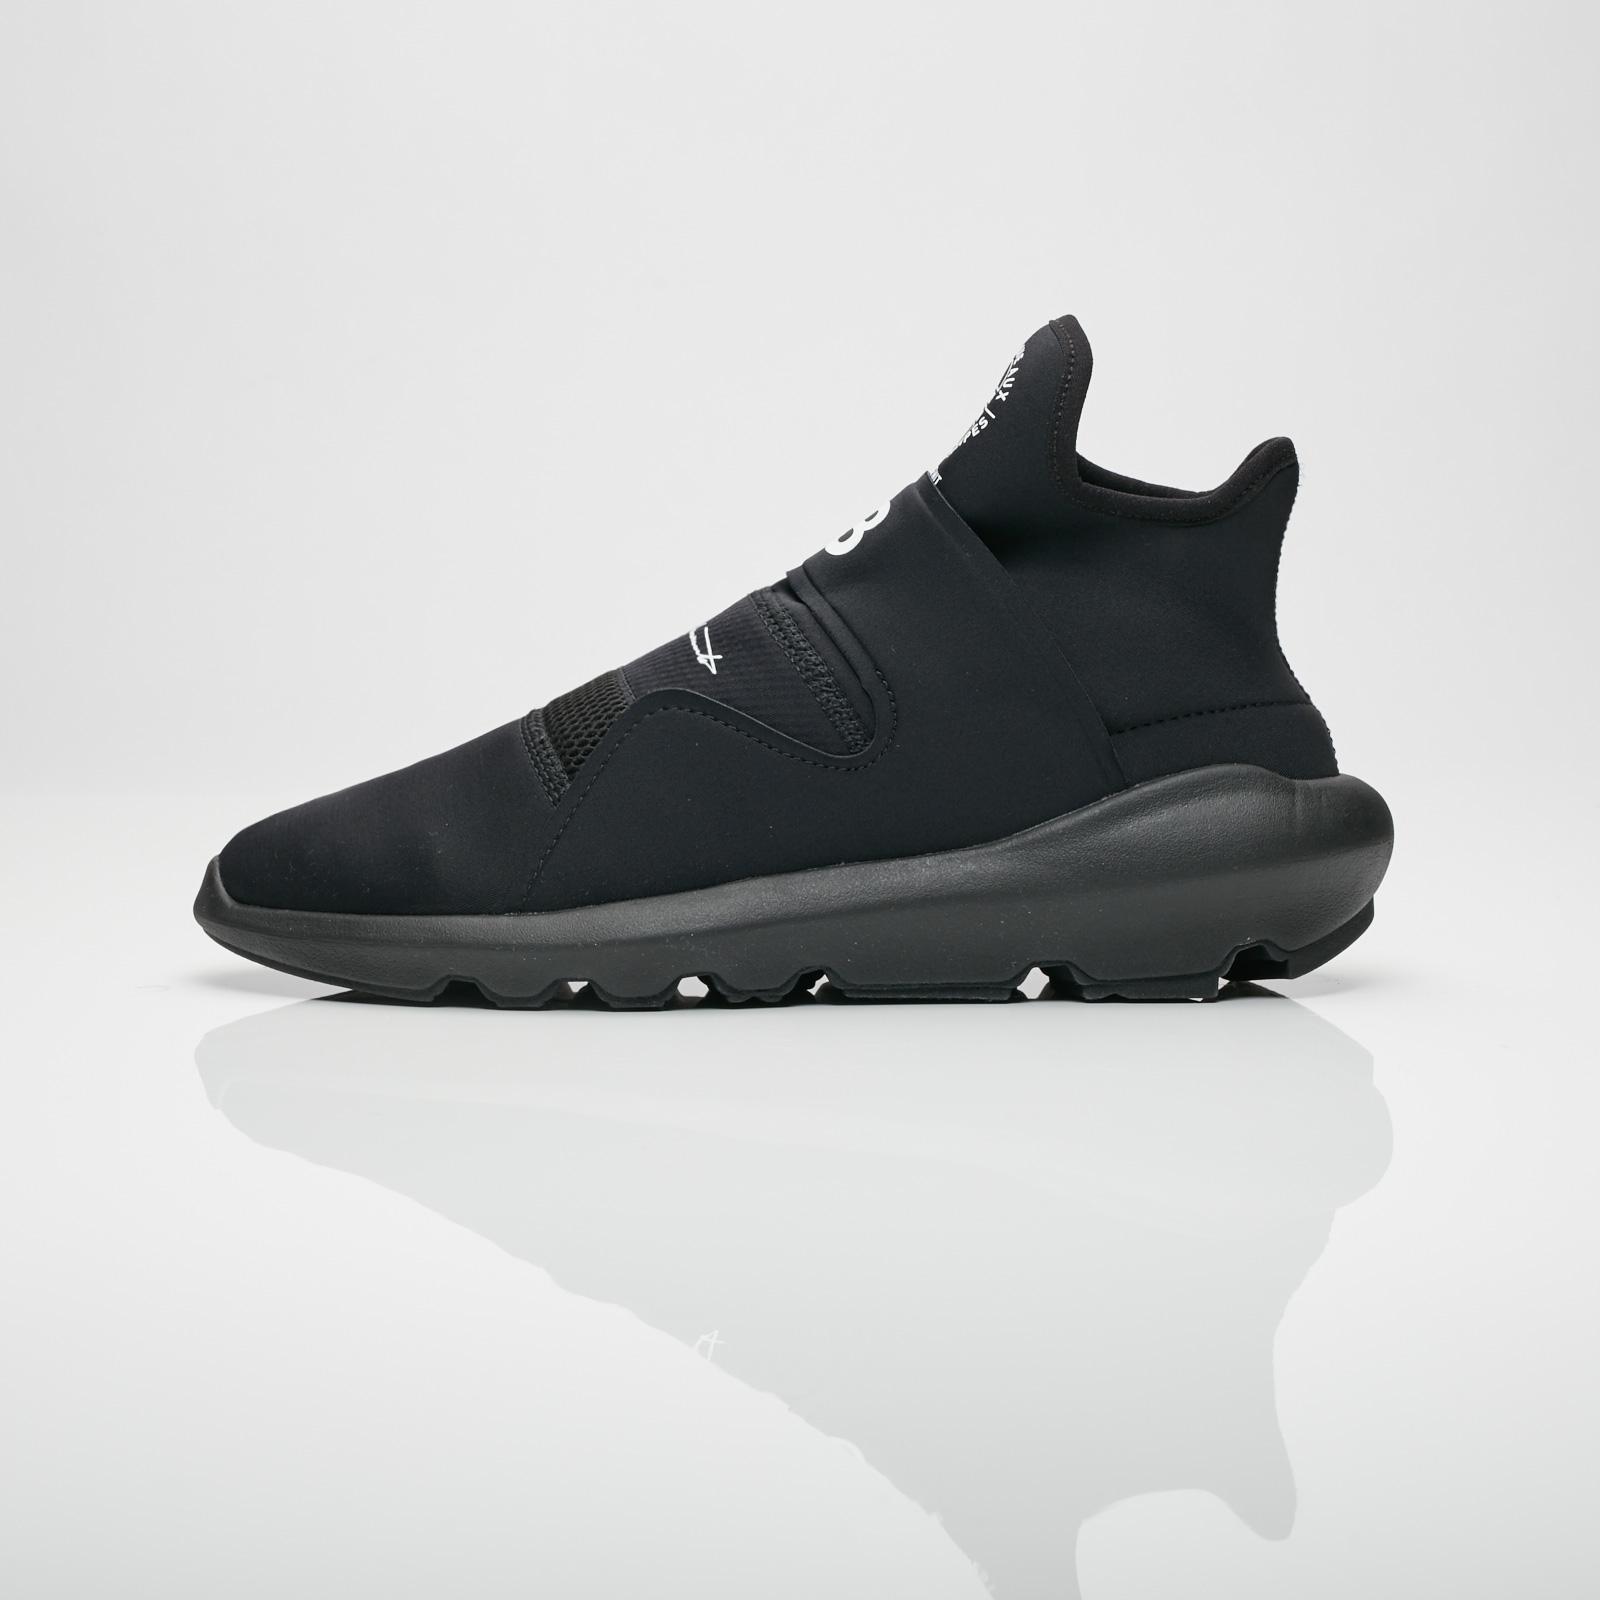 8a9e9fd269a7e adidas Suberou - Ac7201 - Sneakersnstuff